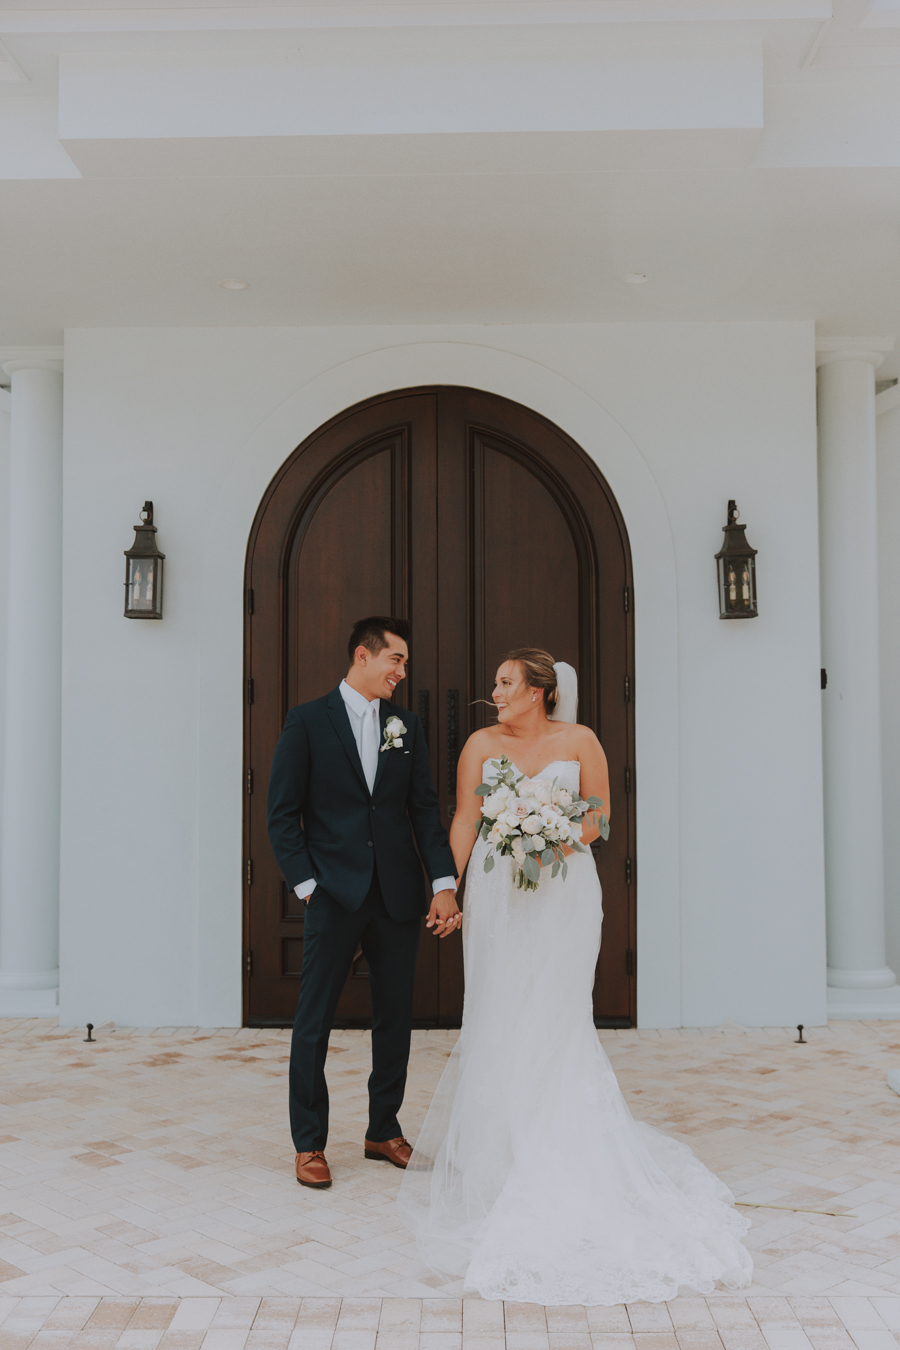 Harborside Chapel Wedding Clearwater Affordable Tampa Venues BHLDN Palm Harbor Safety Harbor Resort and Spa Wedding Malindy Elene Bridal St Pete Wedding Photographer Tampa Wedding Photographer-70.jpg